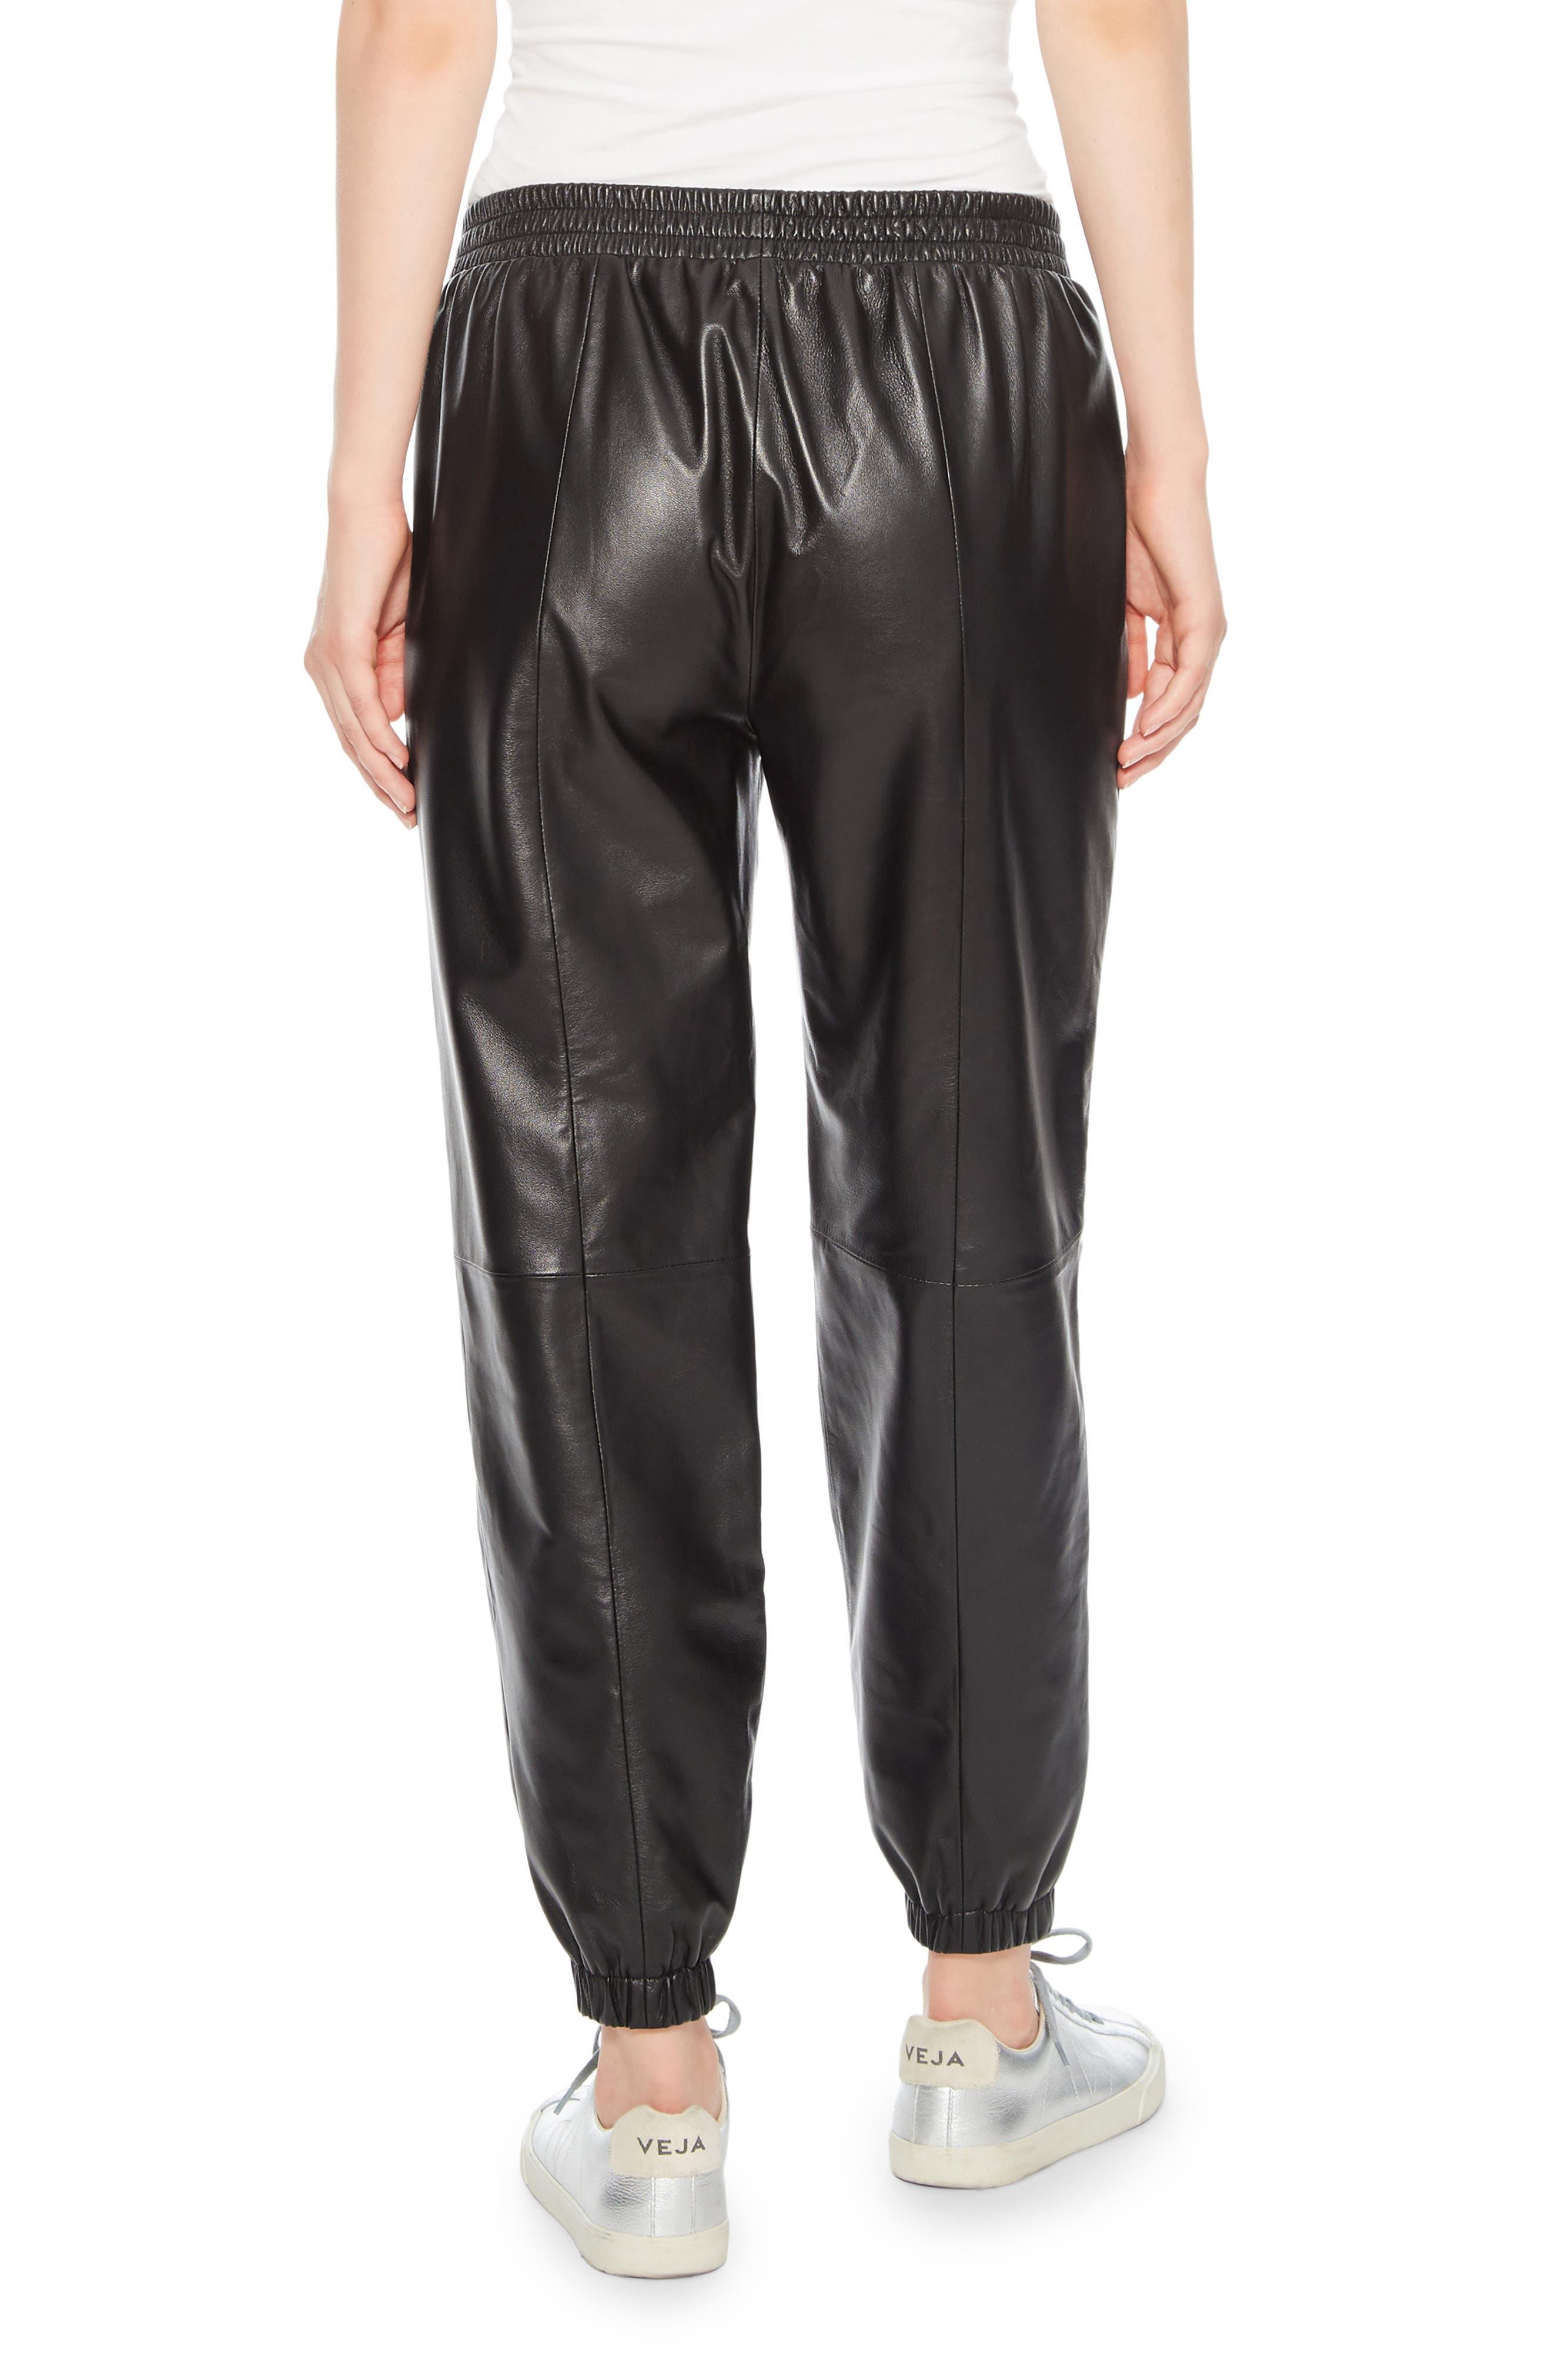 Eavan Leather Jogger Pants,                             Alternate thumbnail 2, color,                             001